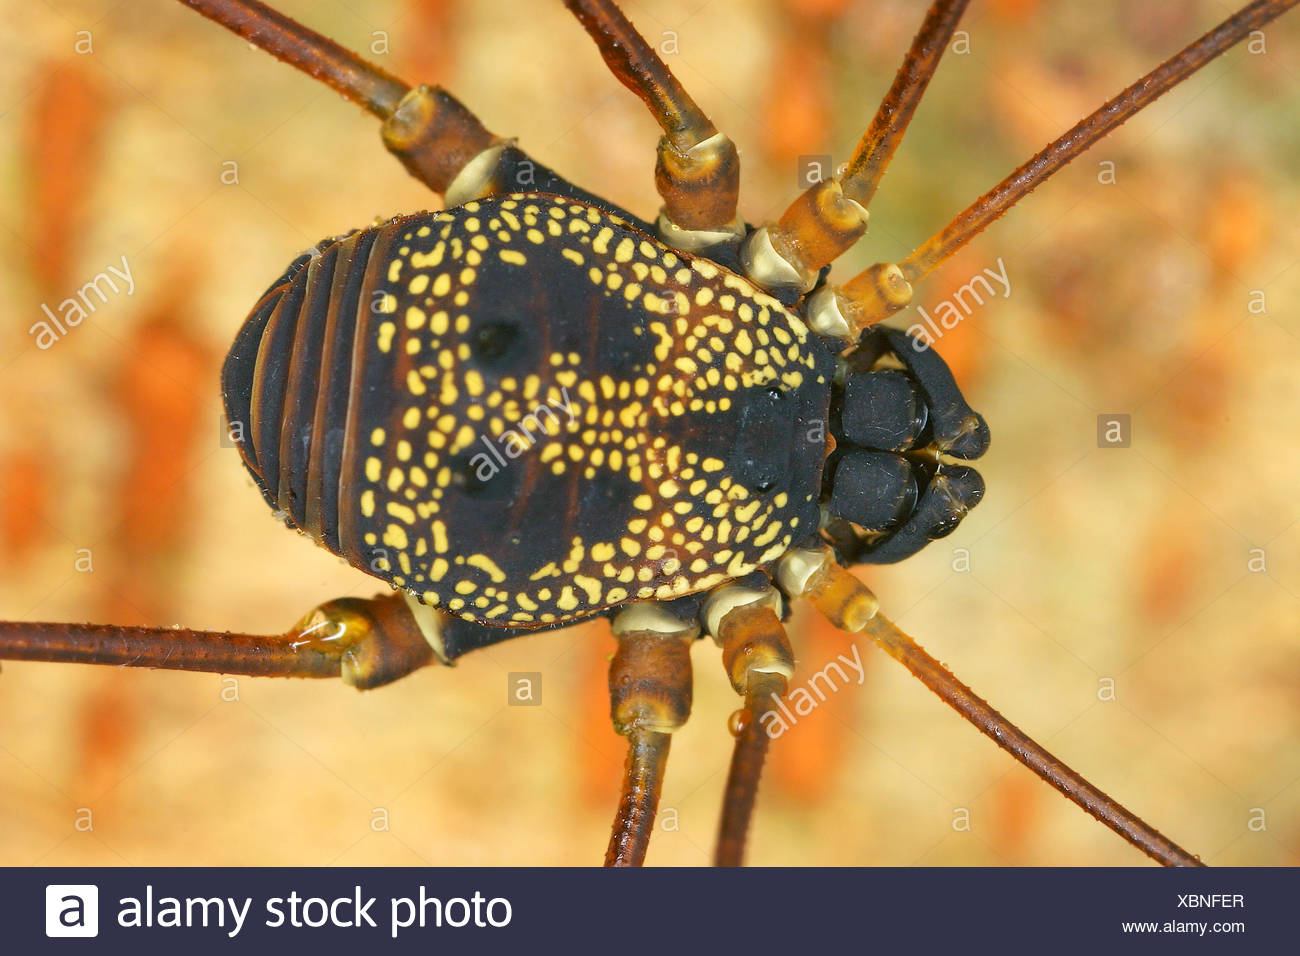 Weberknecht, Paecilaema chiriquiense (Paecilaema chiriquiense), Koerper, Costa Rica | harvestman (Paecilaema chiriquiense), body - Stock Image